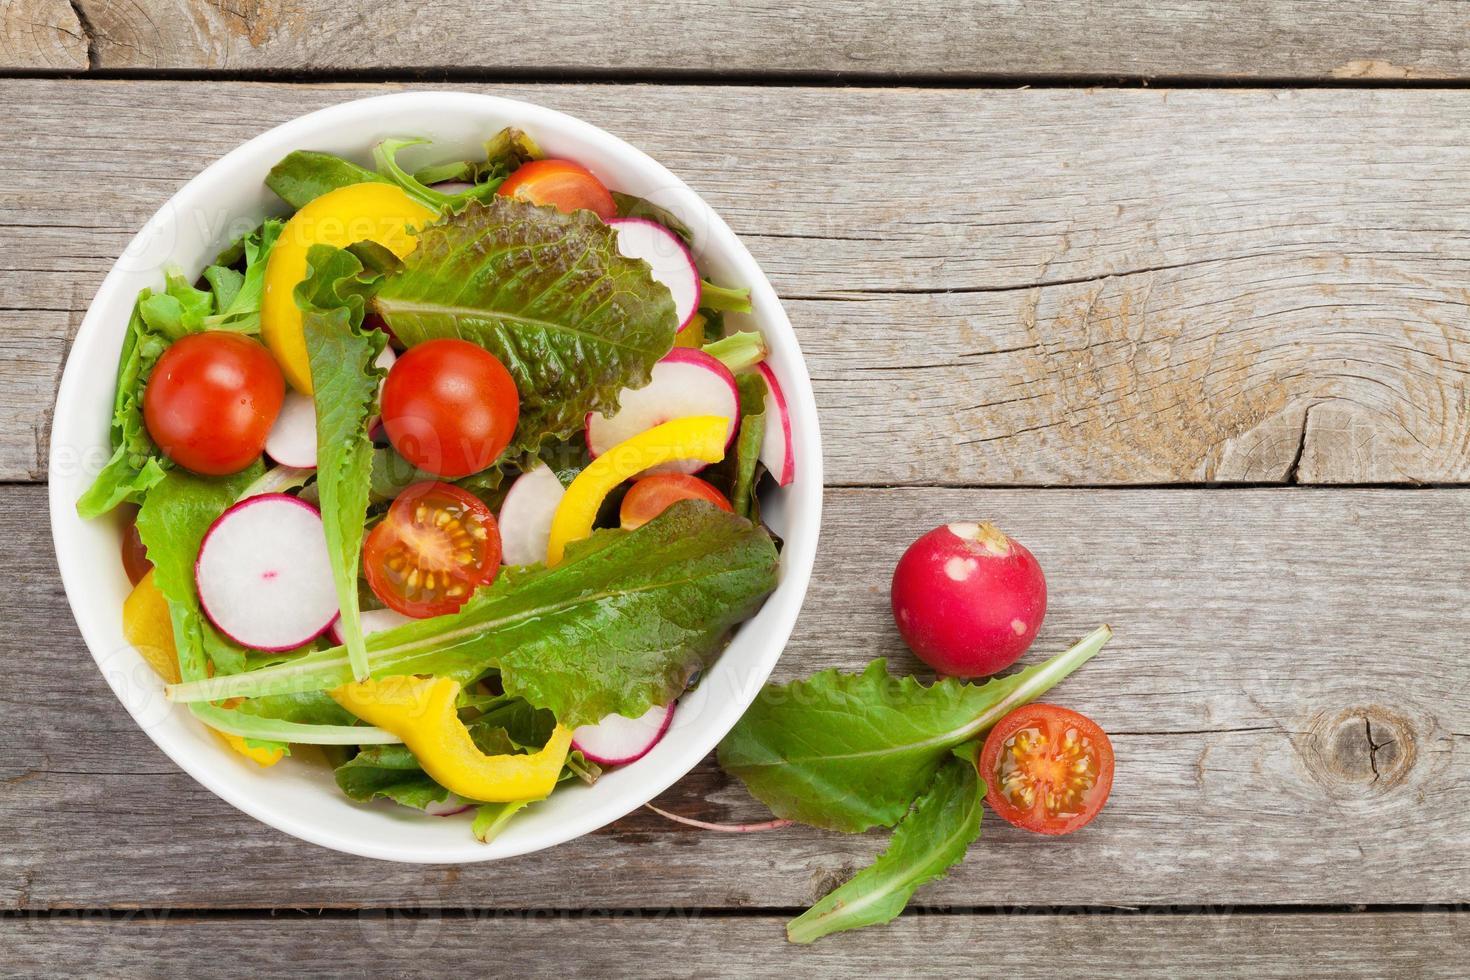 salade fraîche photo